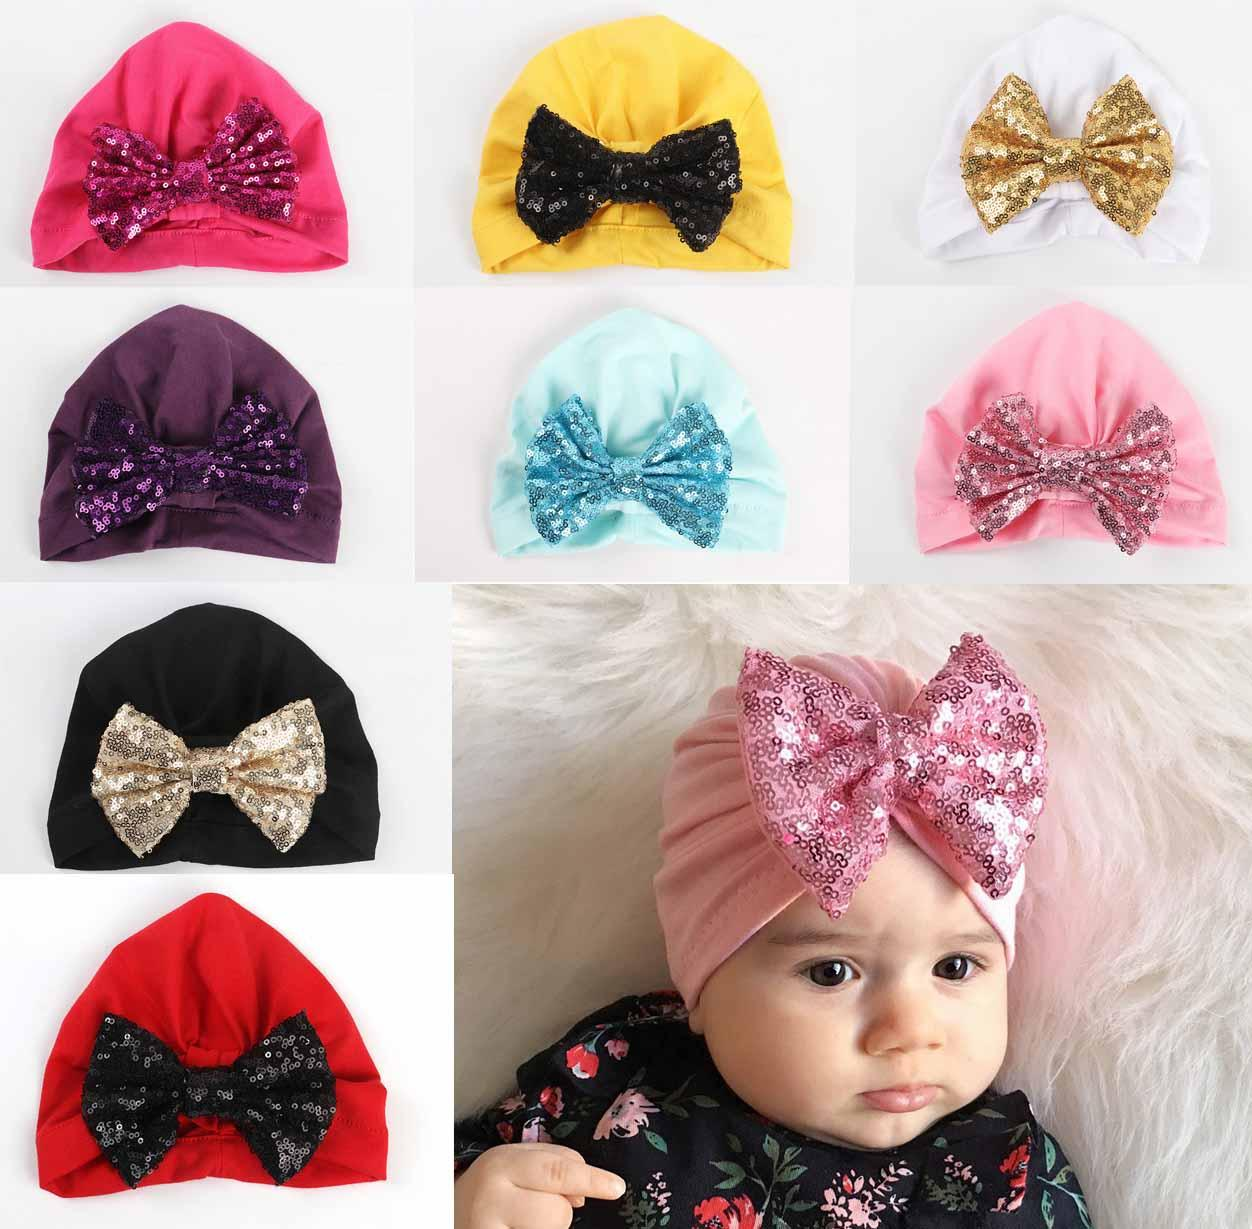 Baby Girl Bandanas Turban Head Wrap Girl Hat Indian Cap Shinning Bowknot  Headband Many Styles Kids Hair Accessories Baby Hair Accessories From  Shunhuico 7ca427ab87a